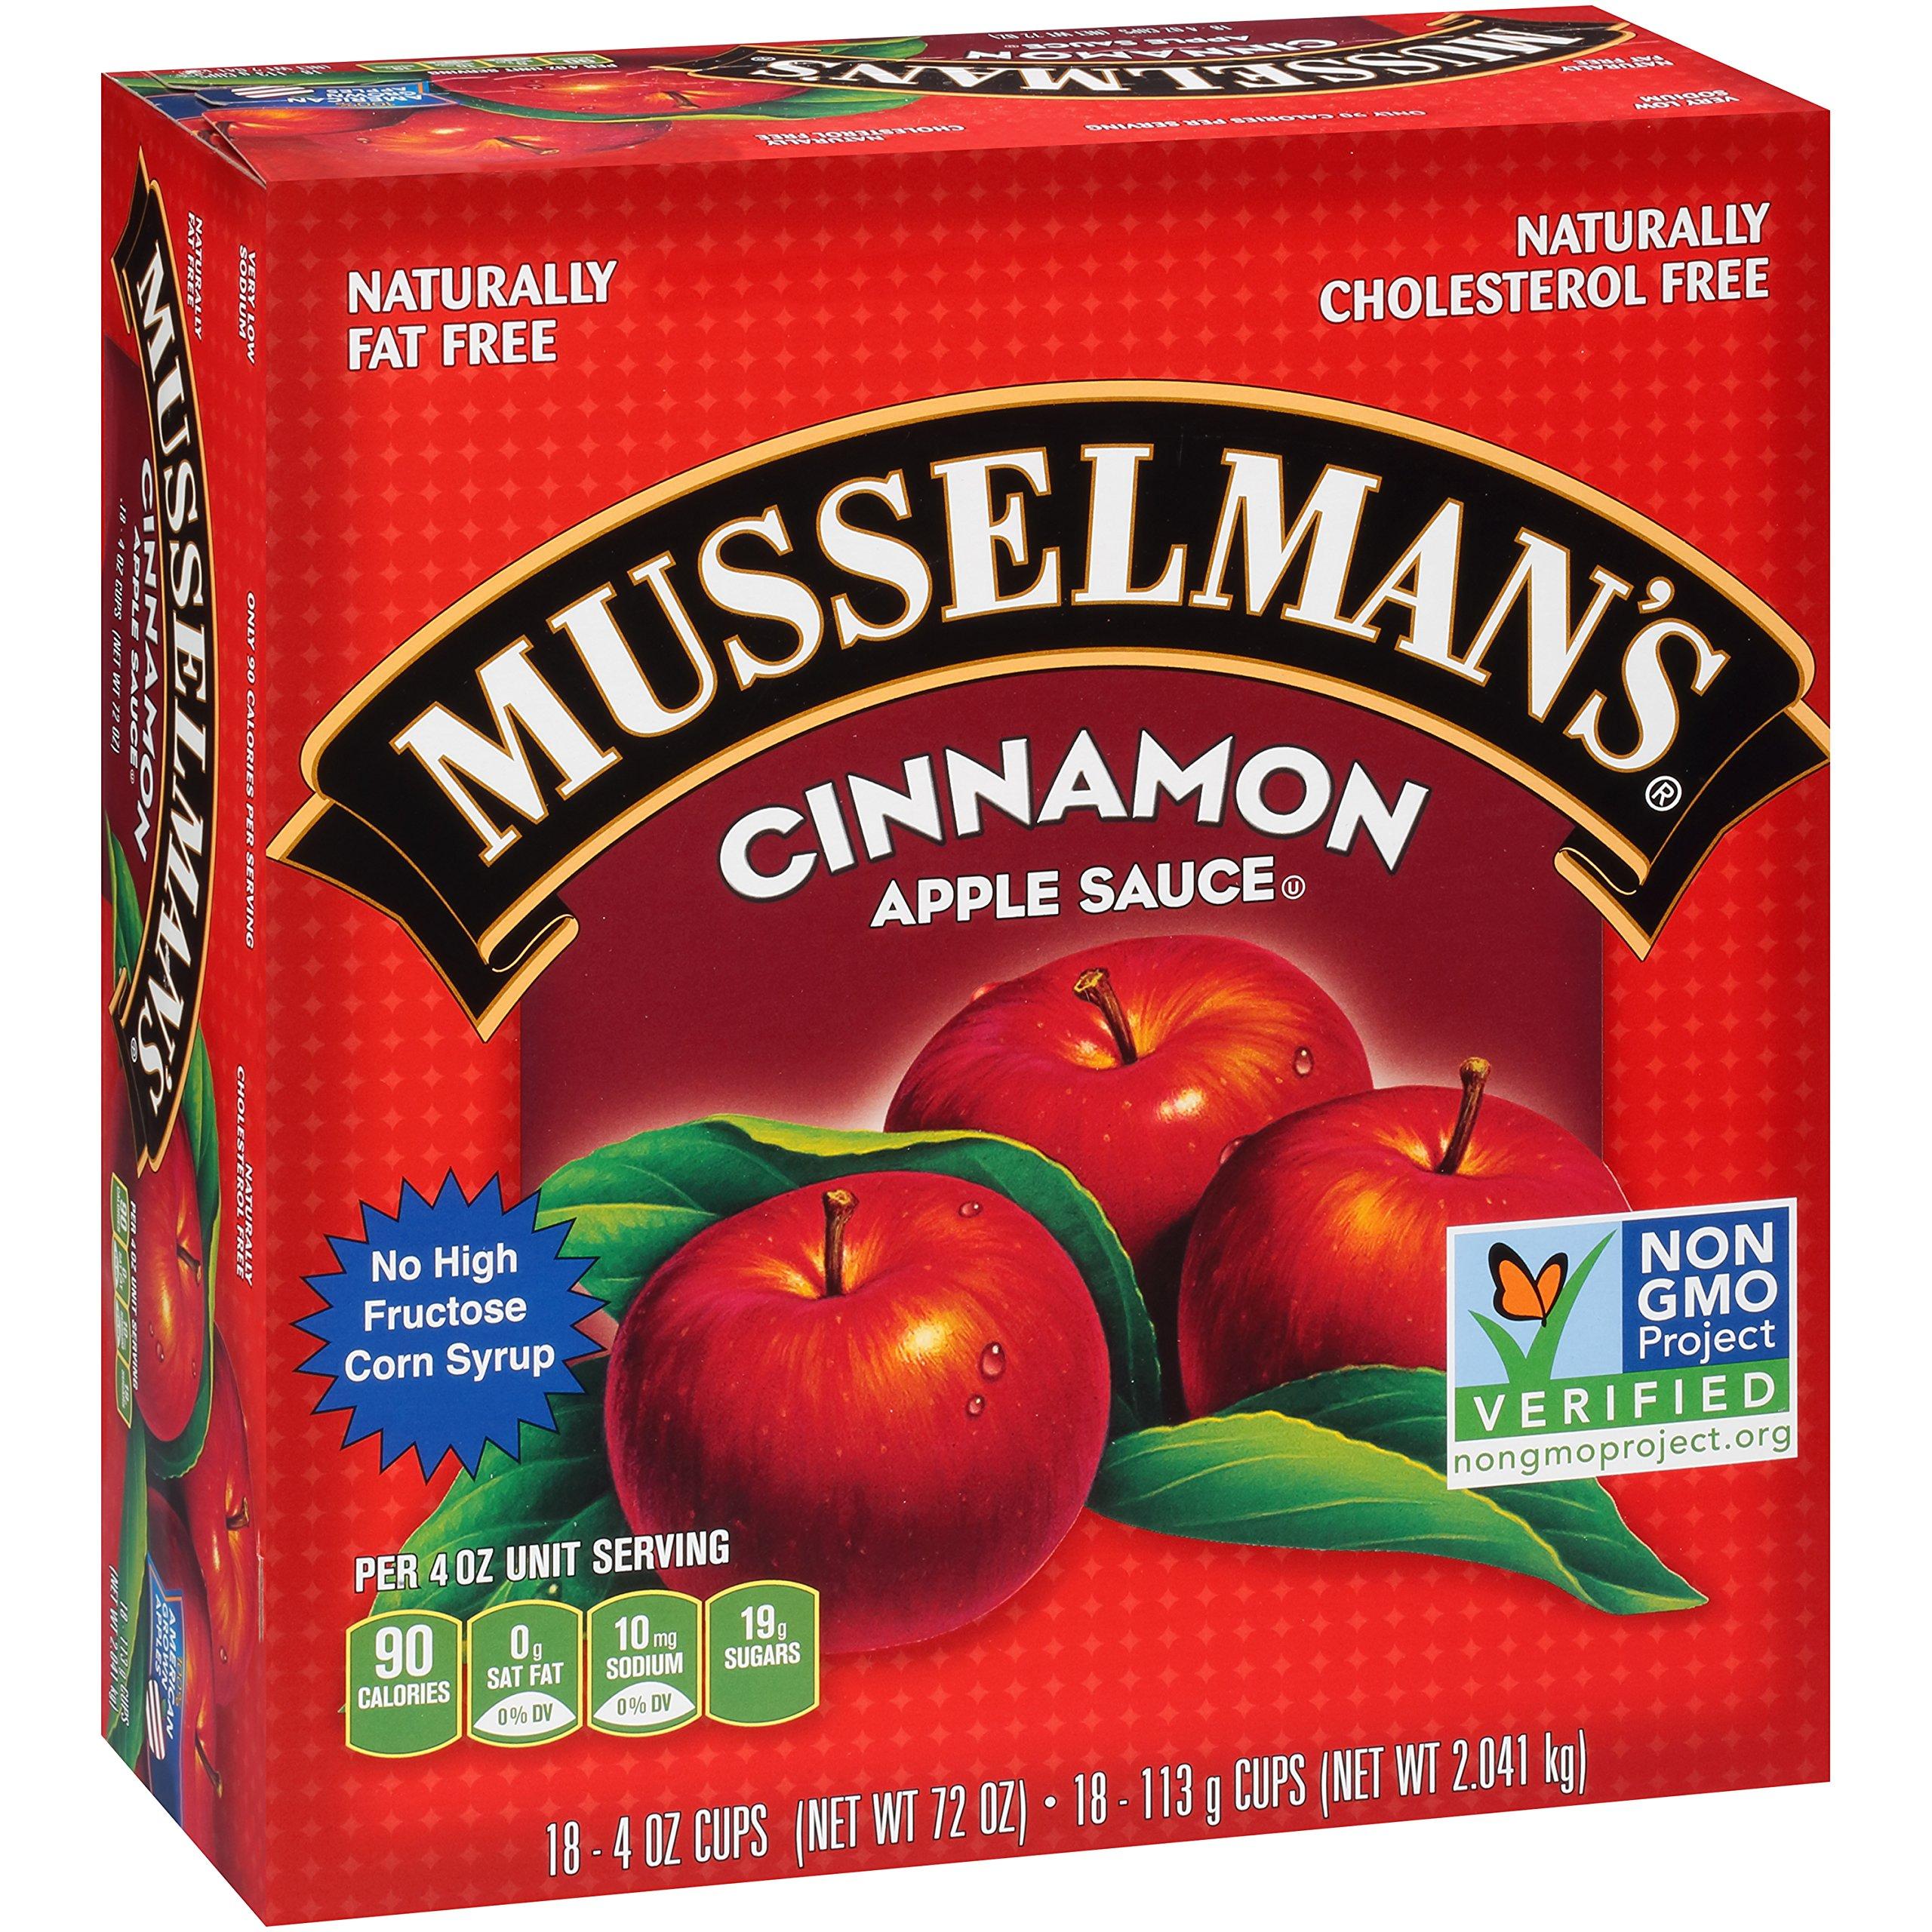 Musselman's Cinnamon Apple Sauce Cups, 4 Ounce by Musselmans